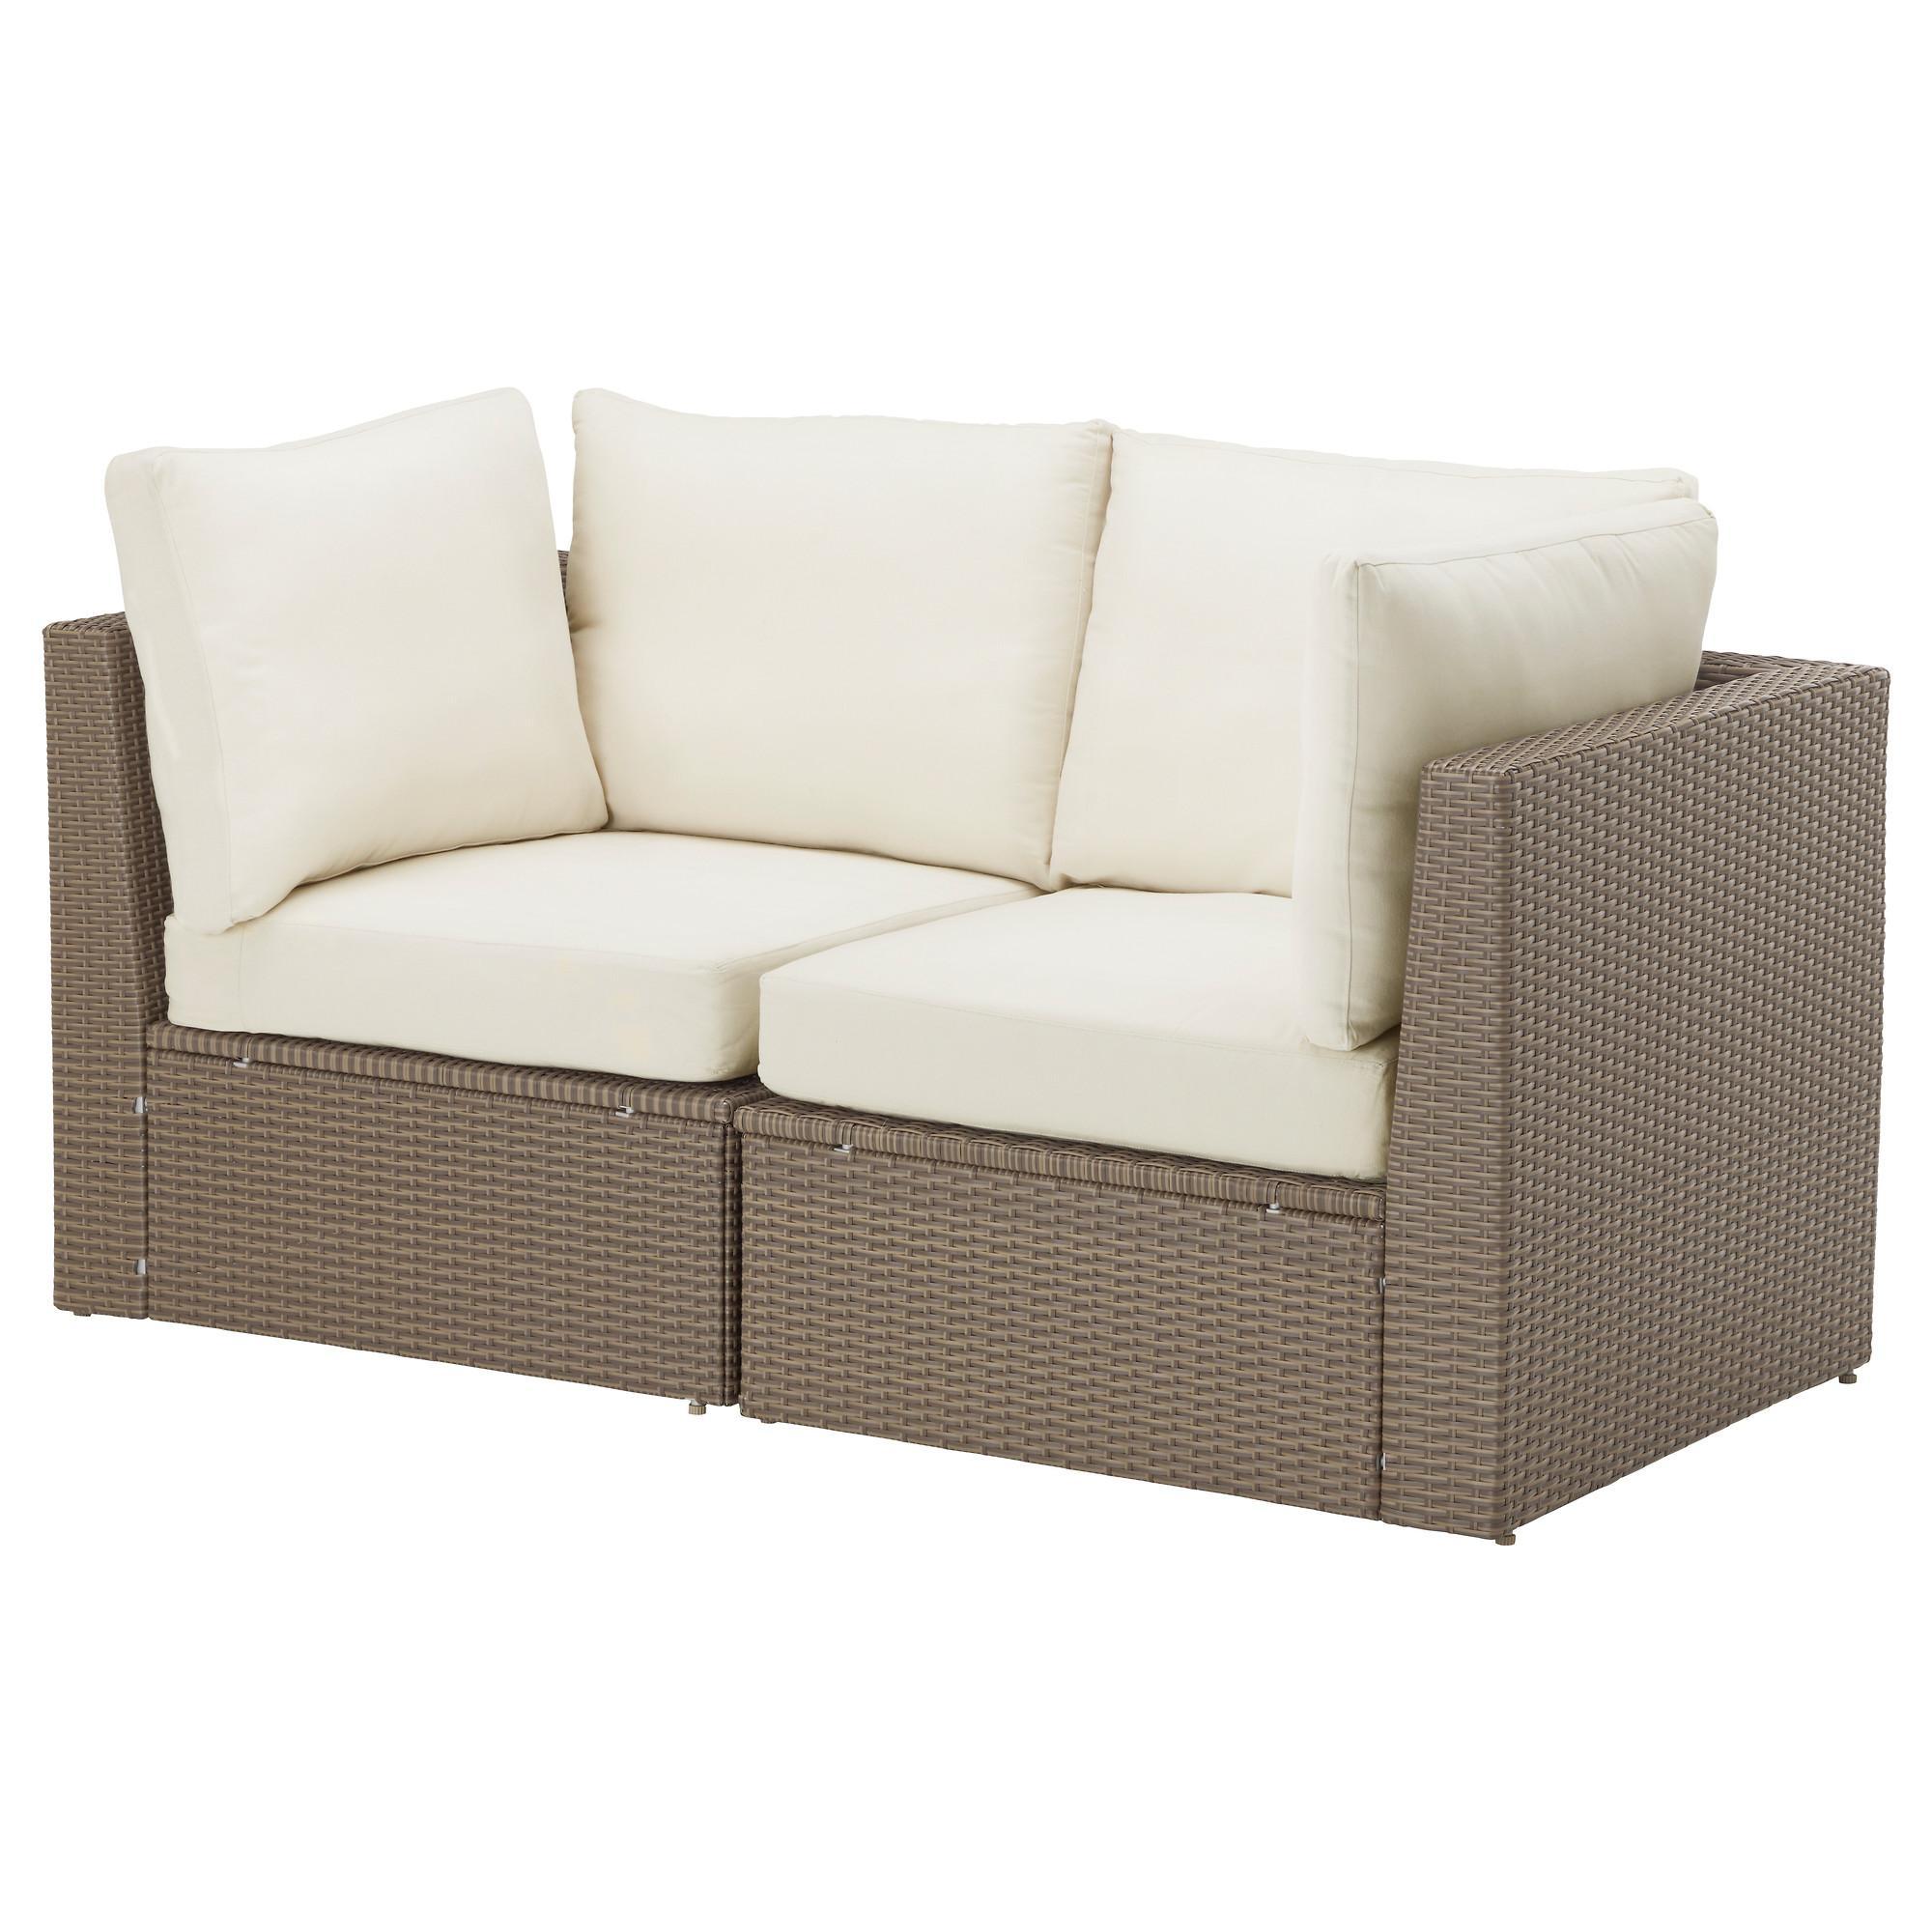 Lounging & Relaxing Furniture – Ikea Regarding Outdoor Sofa Chairs (Image 11 of 20)